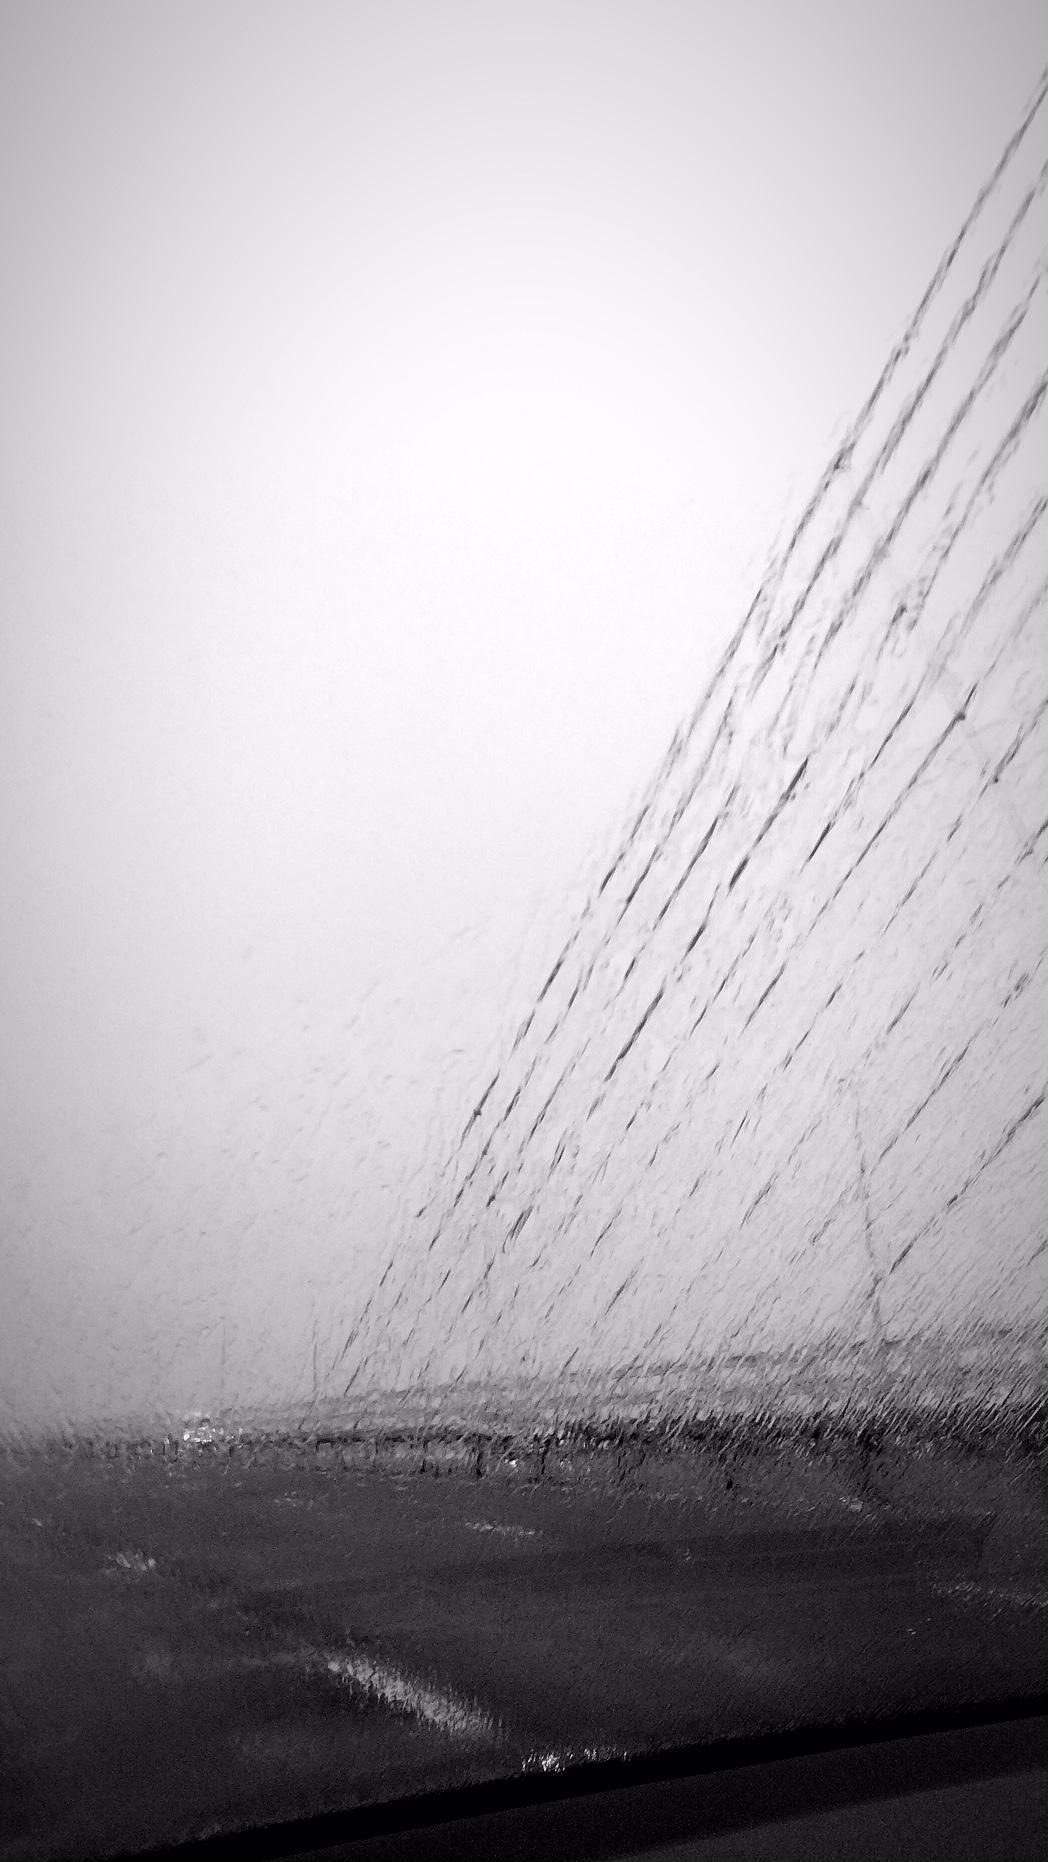 Crossing the Severn Bridge